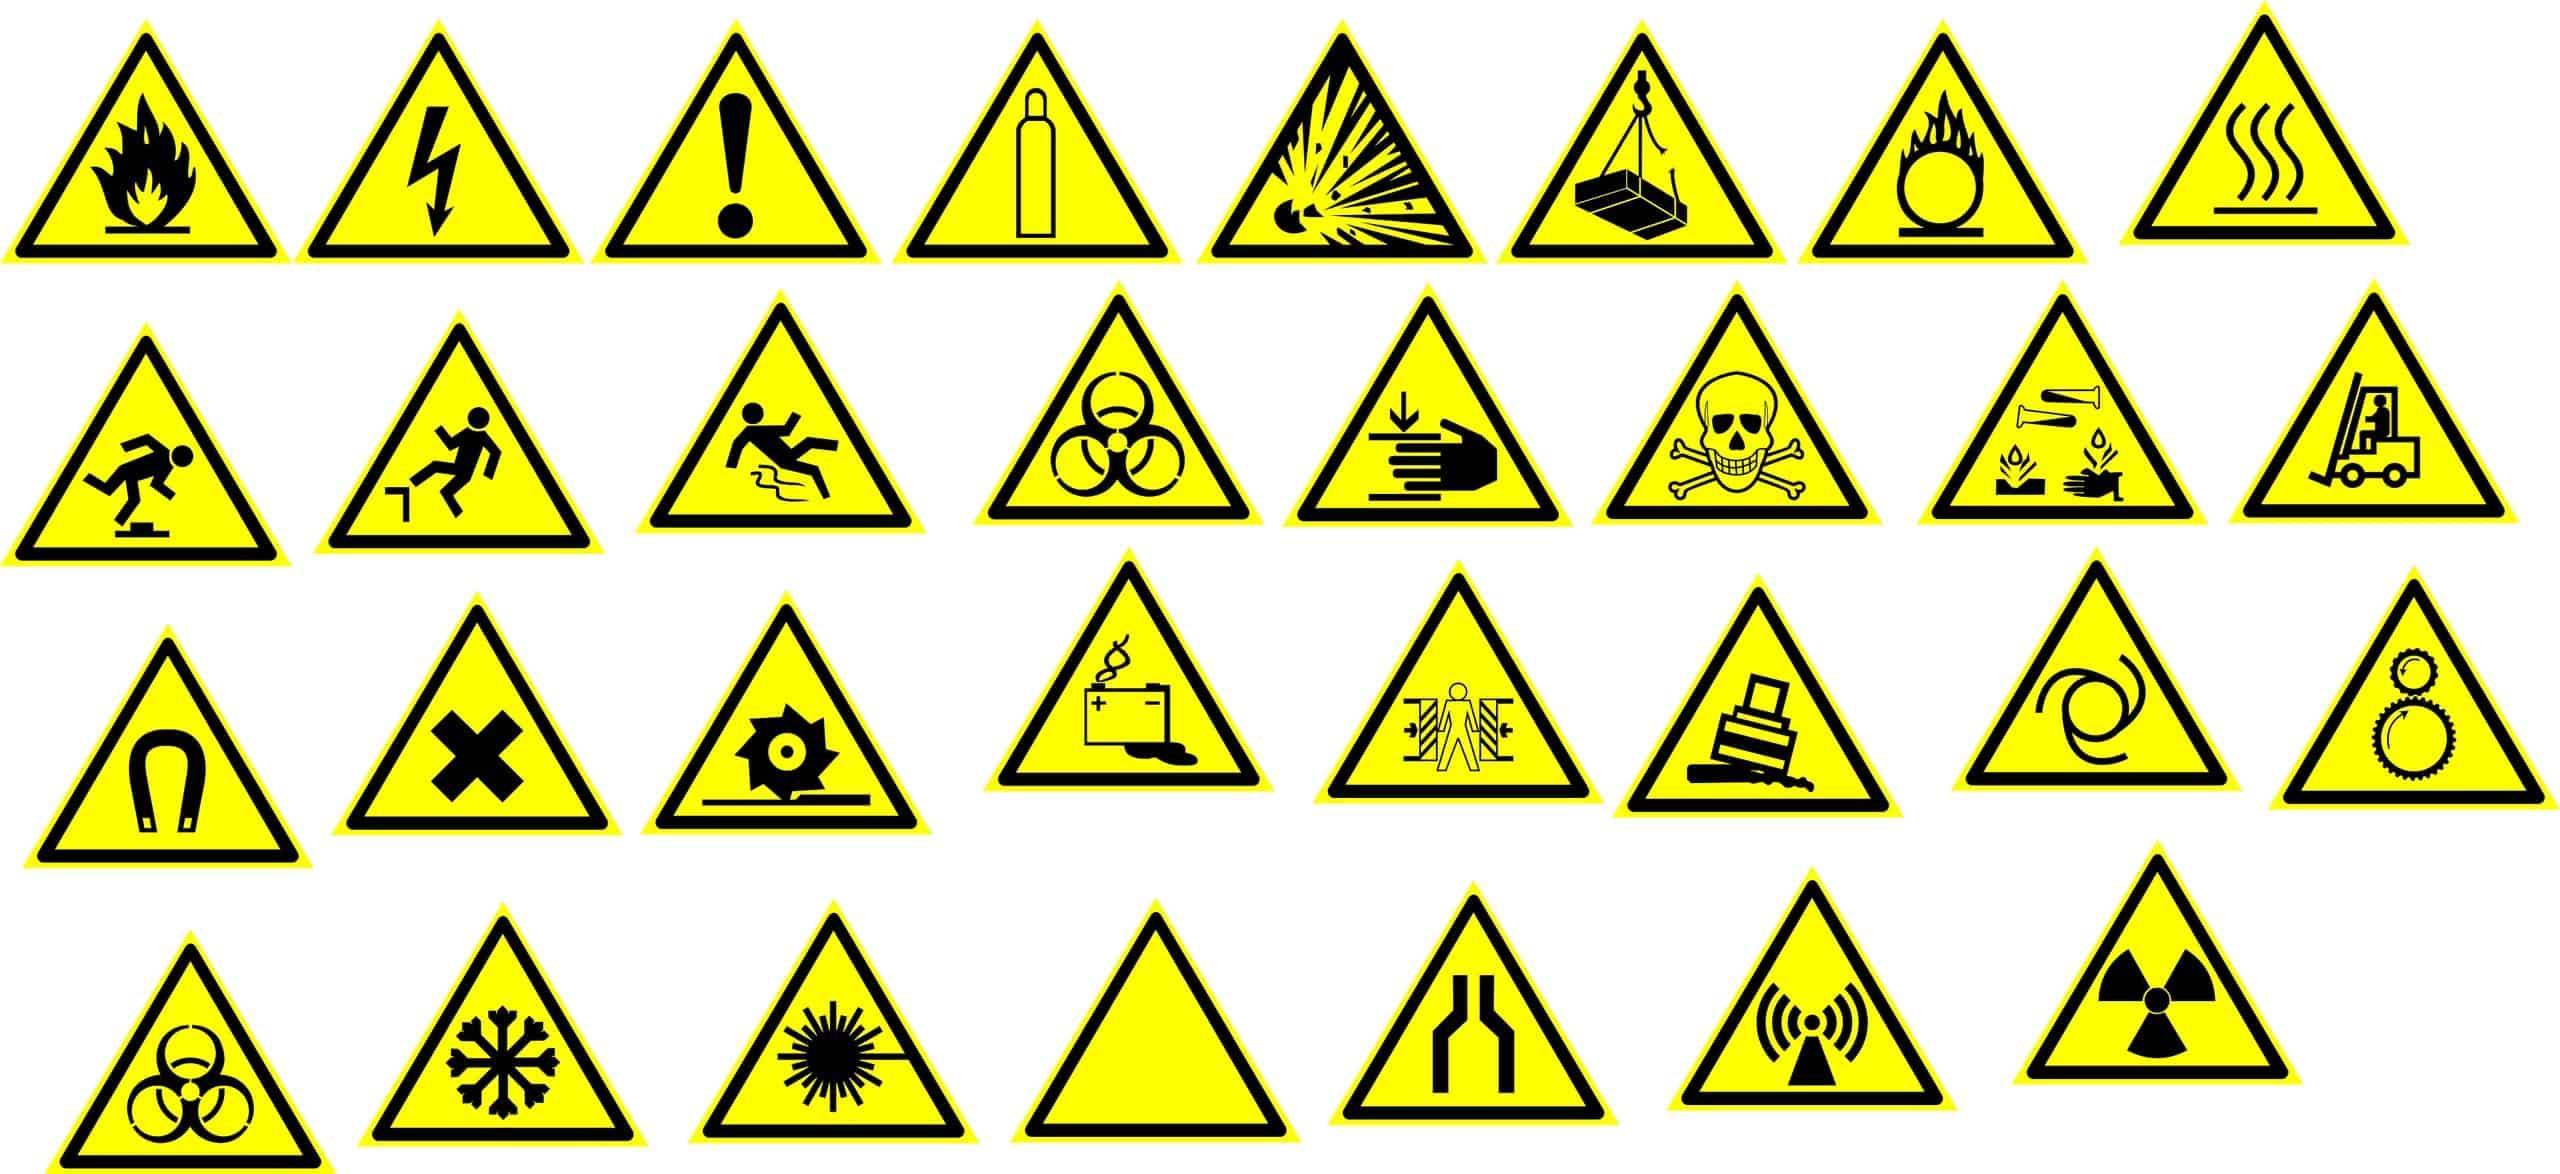 Signs set 1 (cdr)